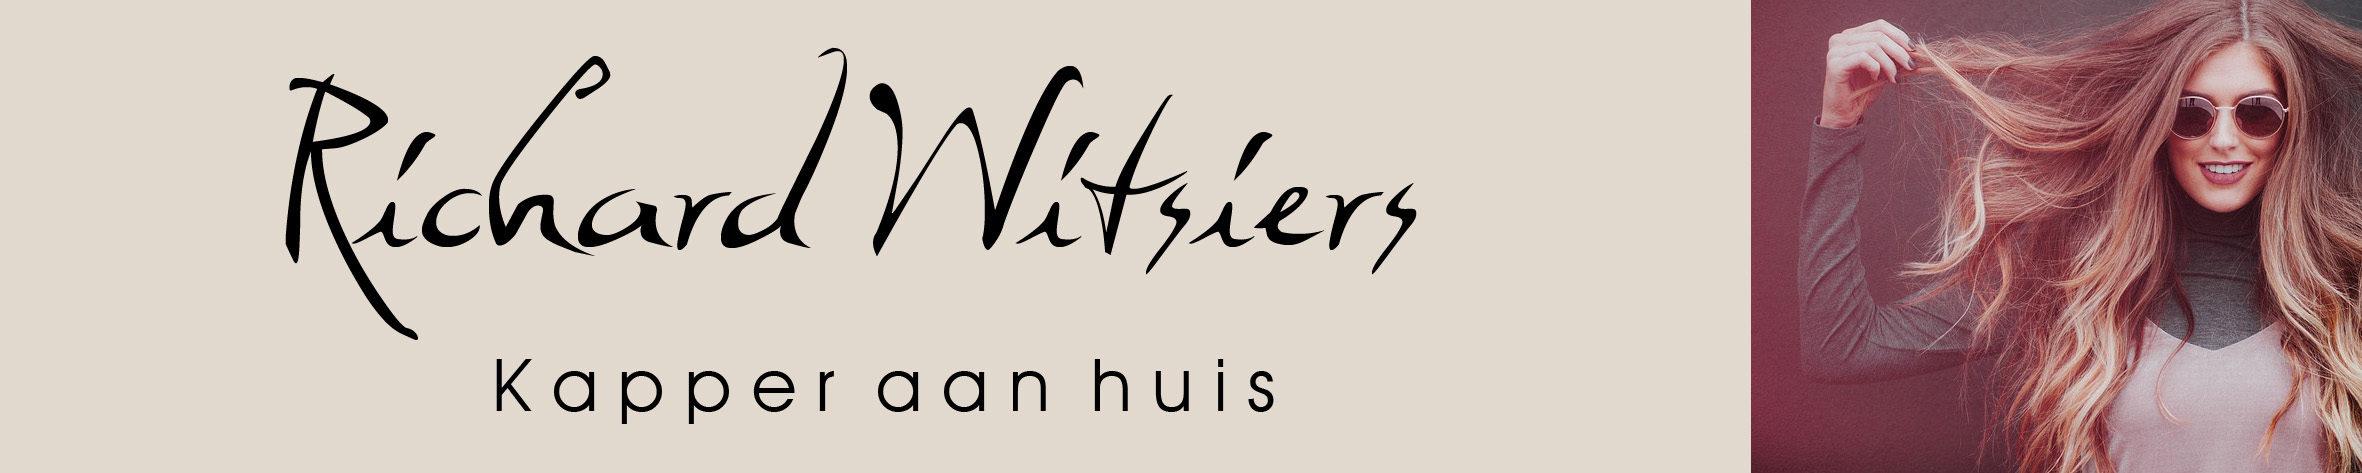 Richard Witsiers thuiskapper Haarlem e.o.